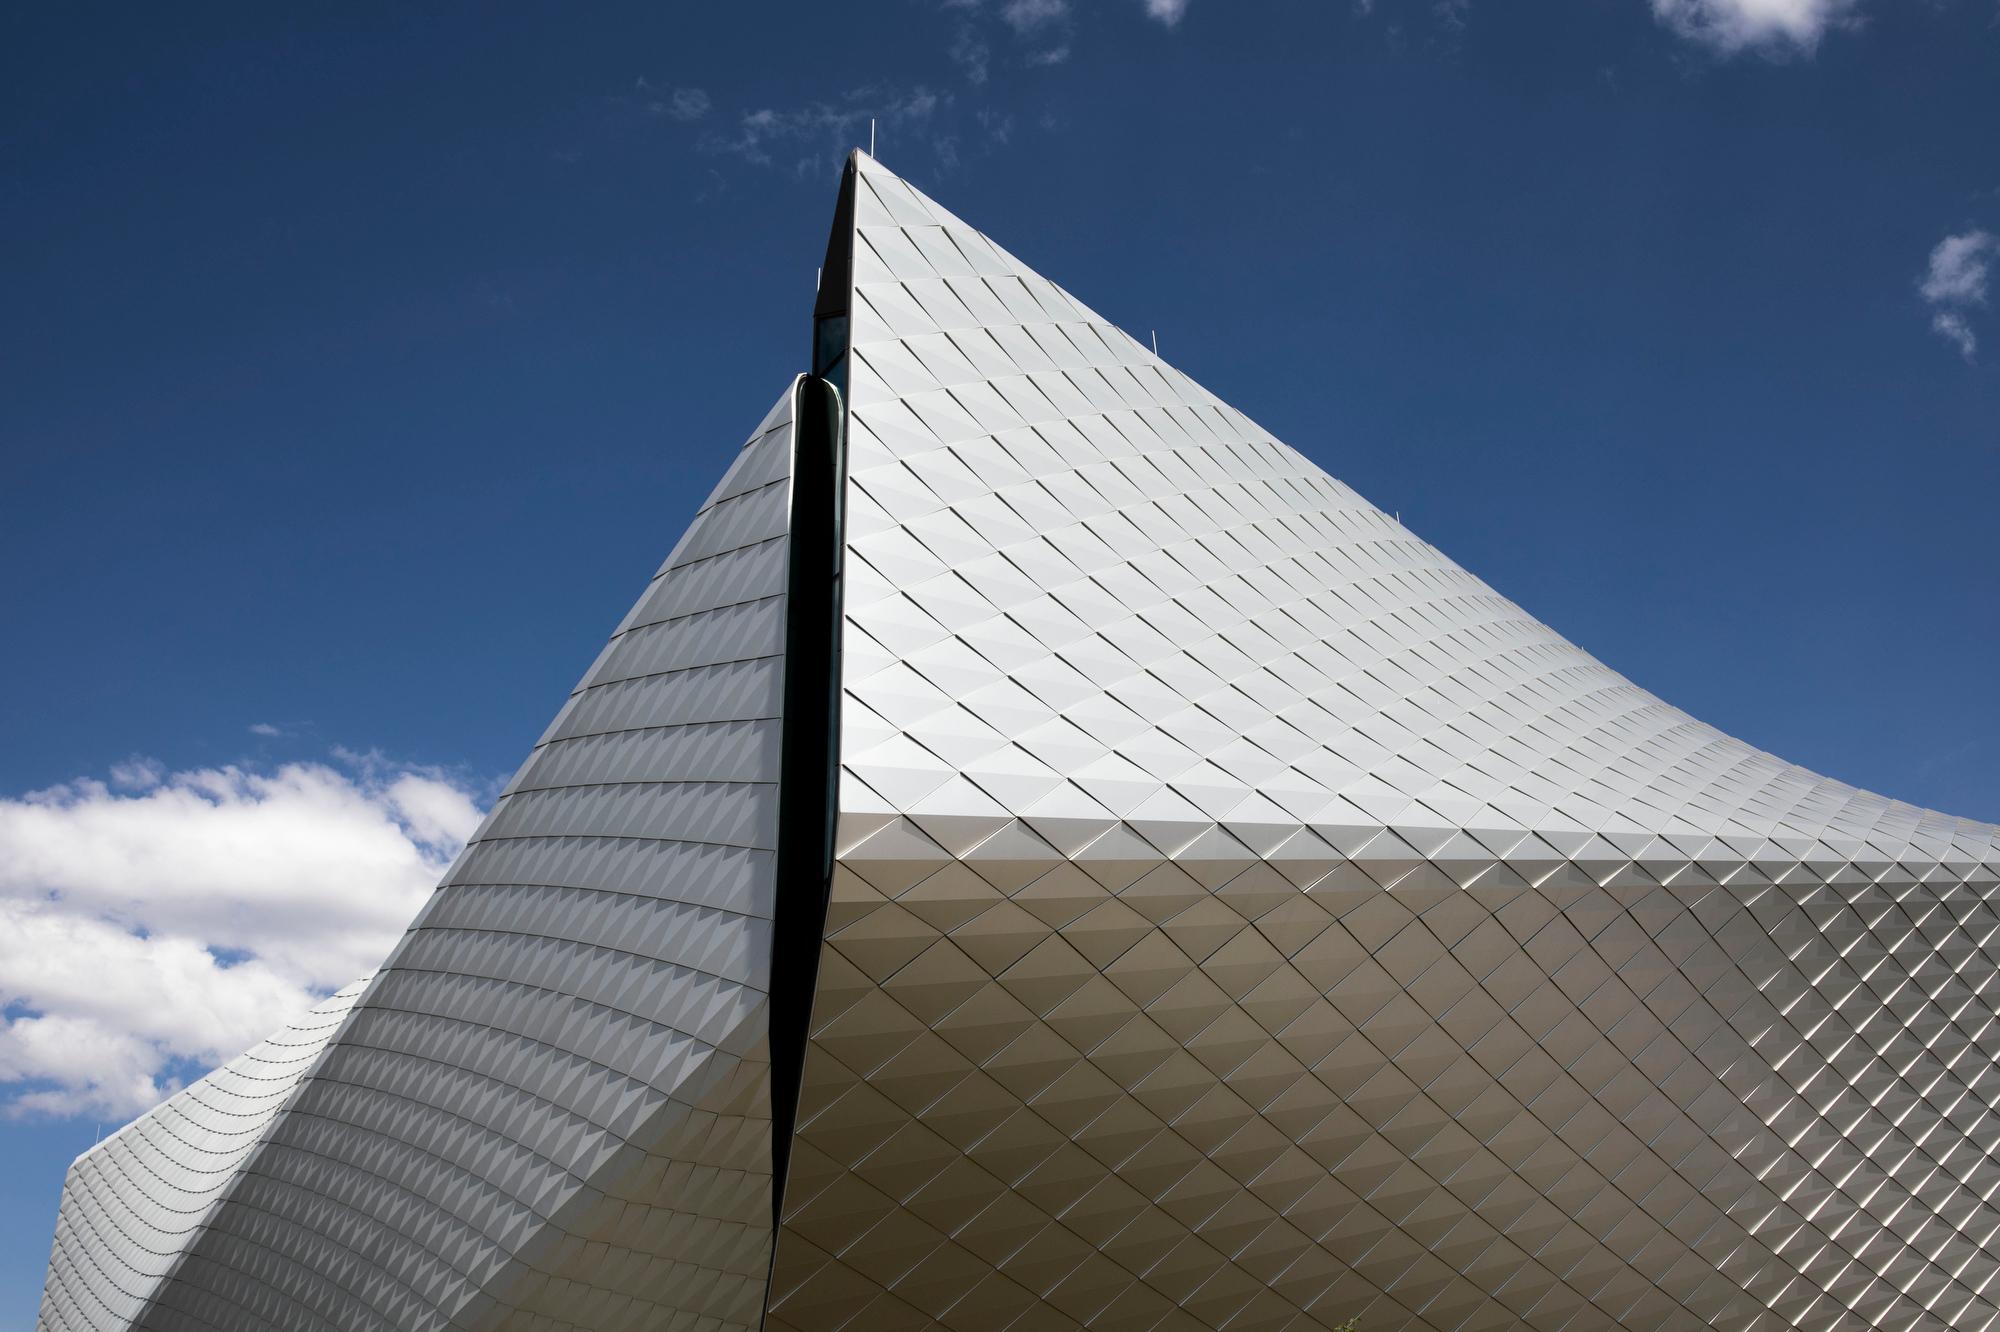 210729-CMOTR-COLORADO-SPRINGS-OLYMPIC-PARALYMPIC-MUSEUM